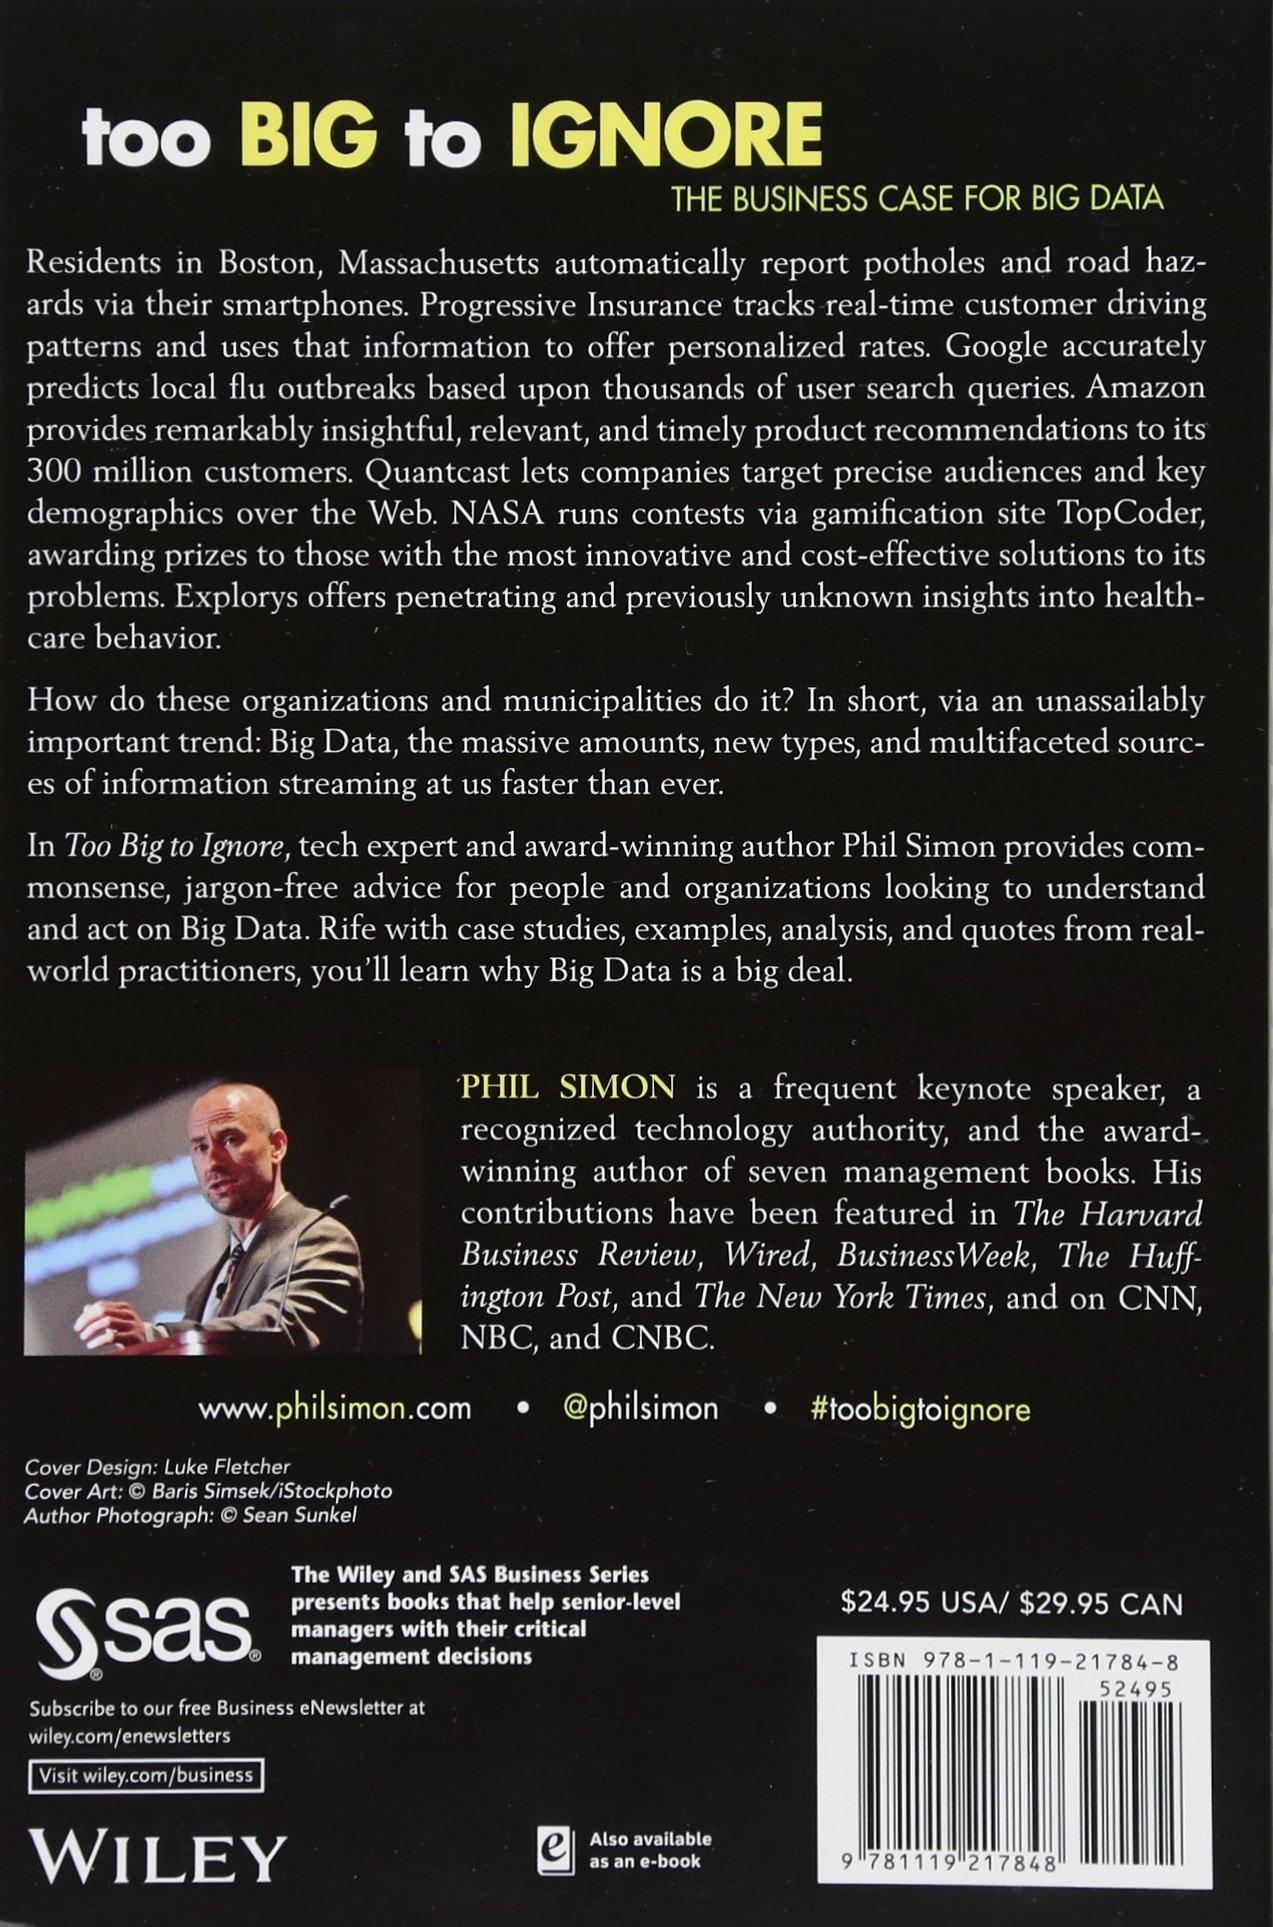 Too Big to Ignore: The Business Case for Big Data Wiley and SAS Business Series: Amazon.es: Phil Simon: Libros en idiomas extranjeros